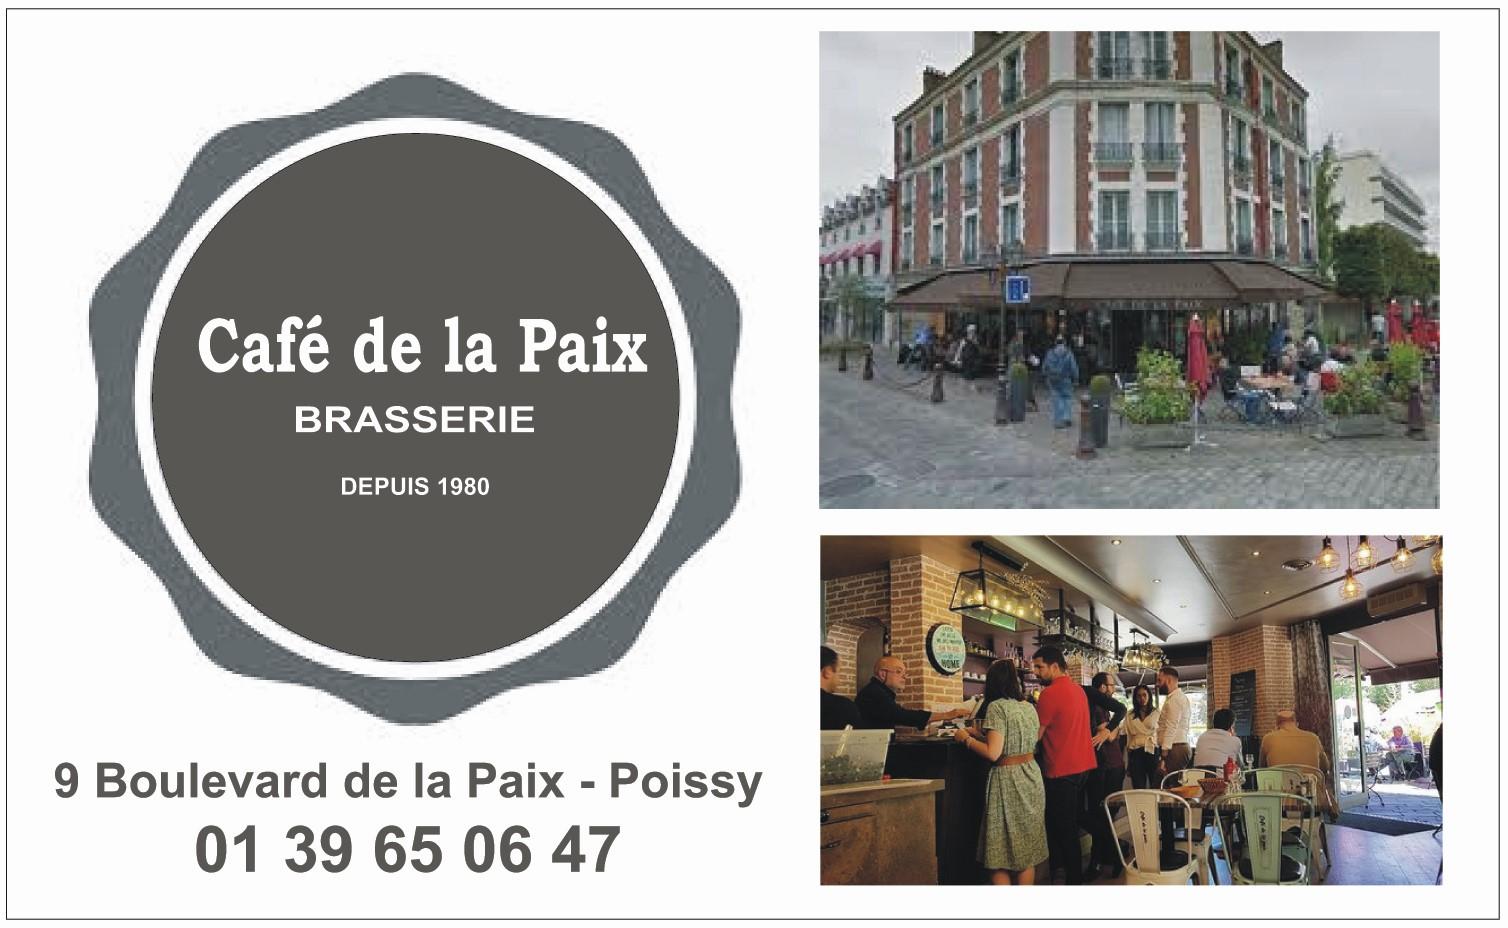 CAFE_DE_LA_PAIX-2019.jpg